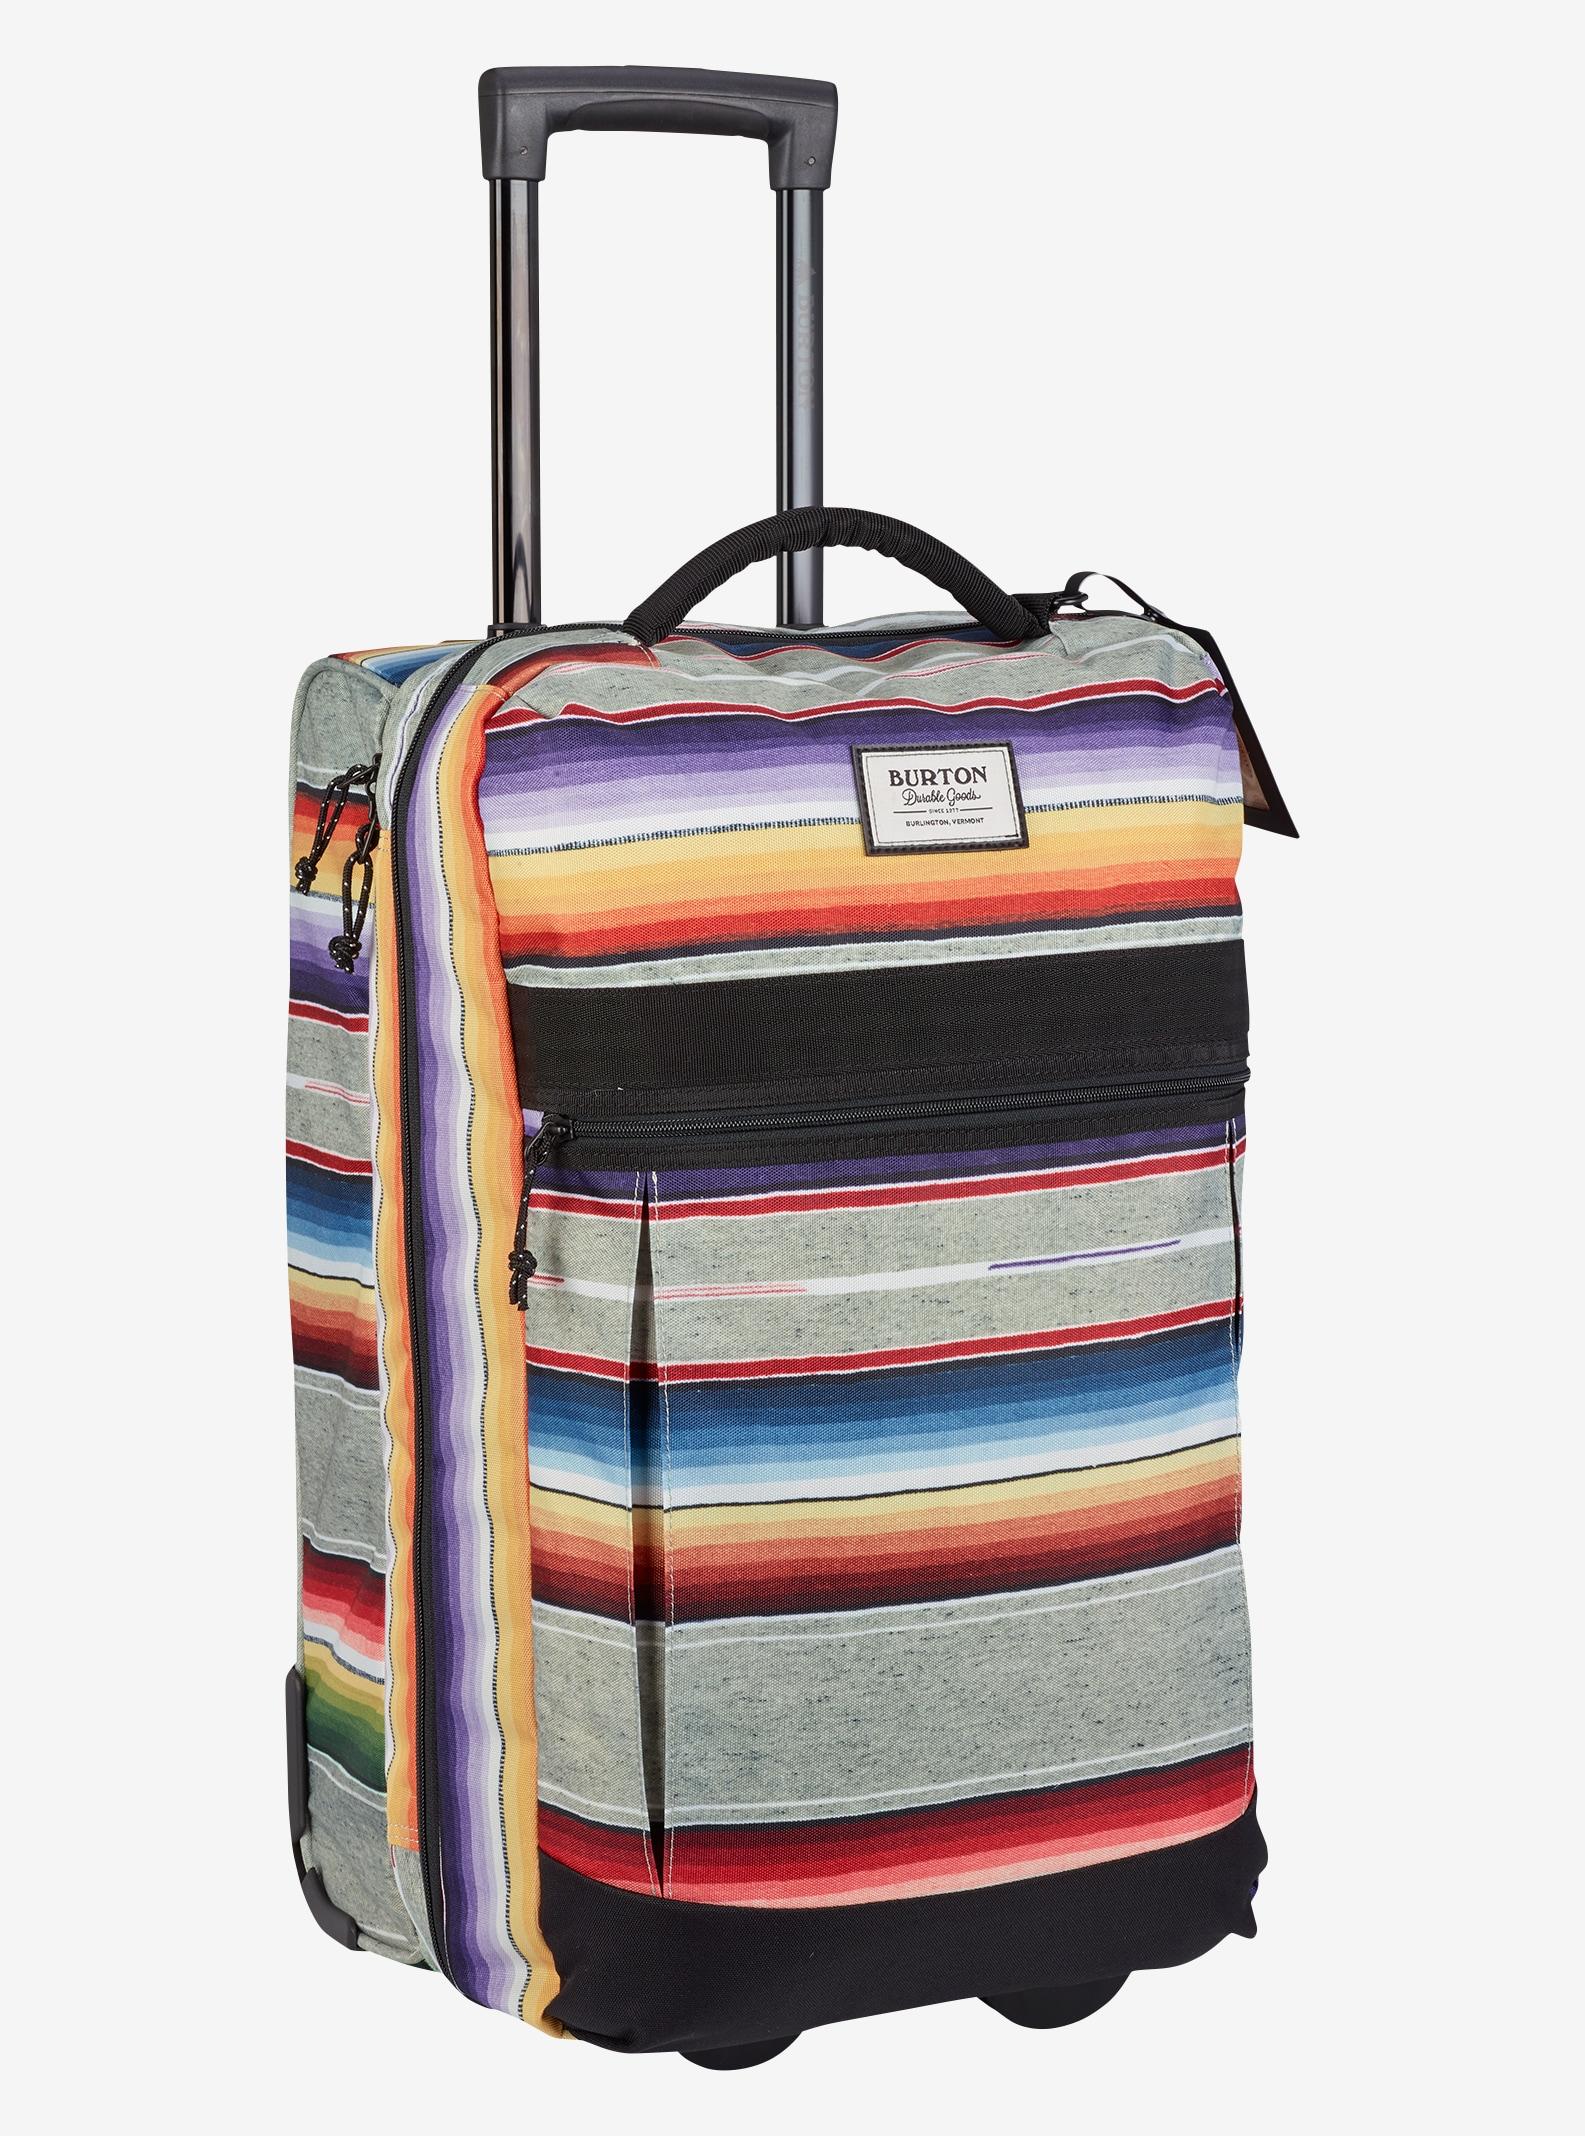 Burton - Valise à roulettes Charter Roller affichage en Bright Sinola Stripe Print